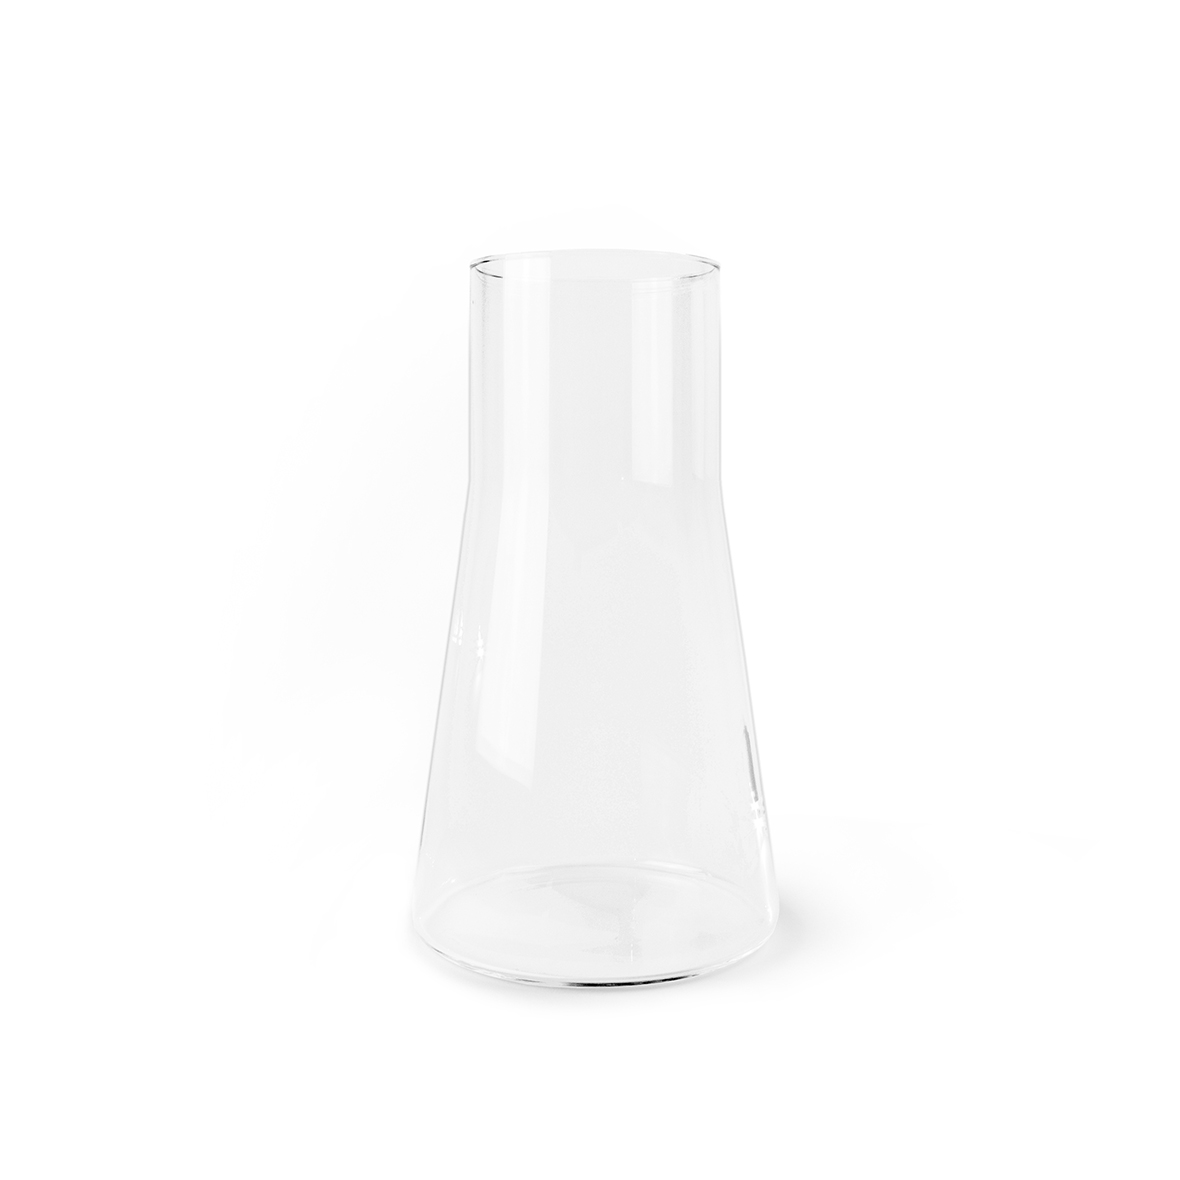 vase durstloescher gross fidea design